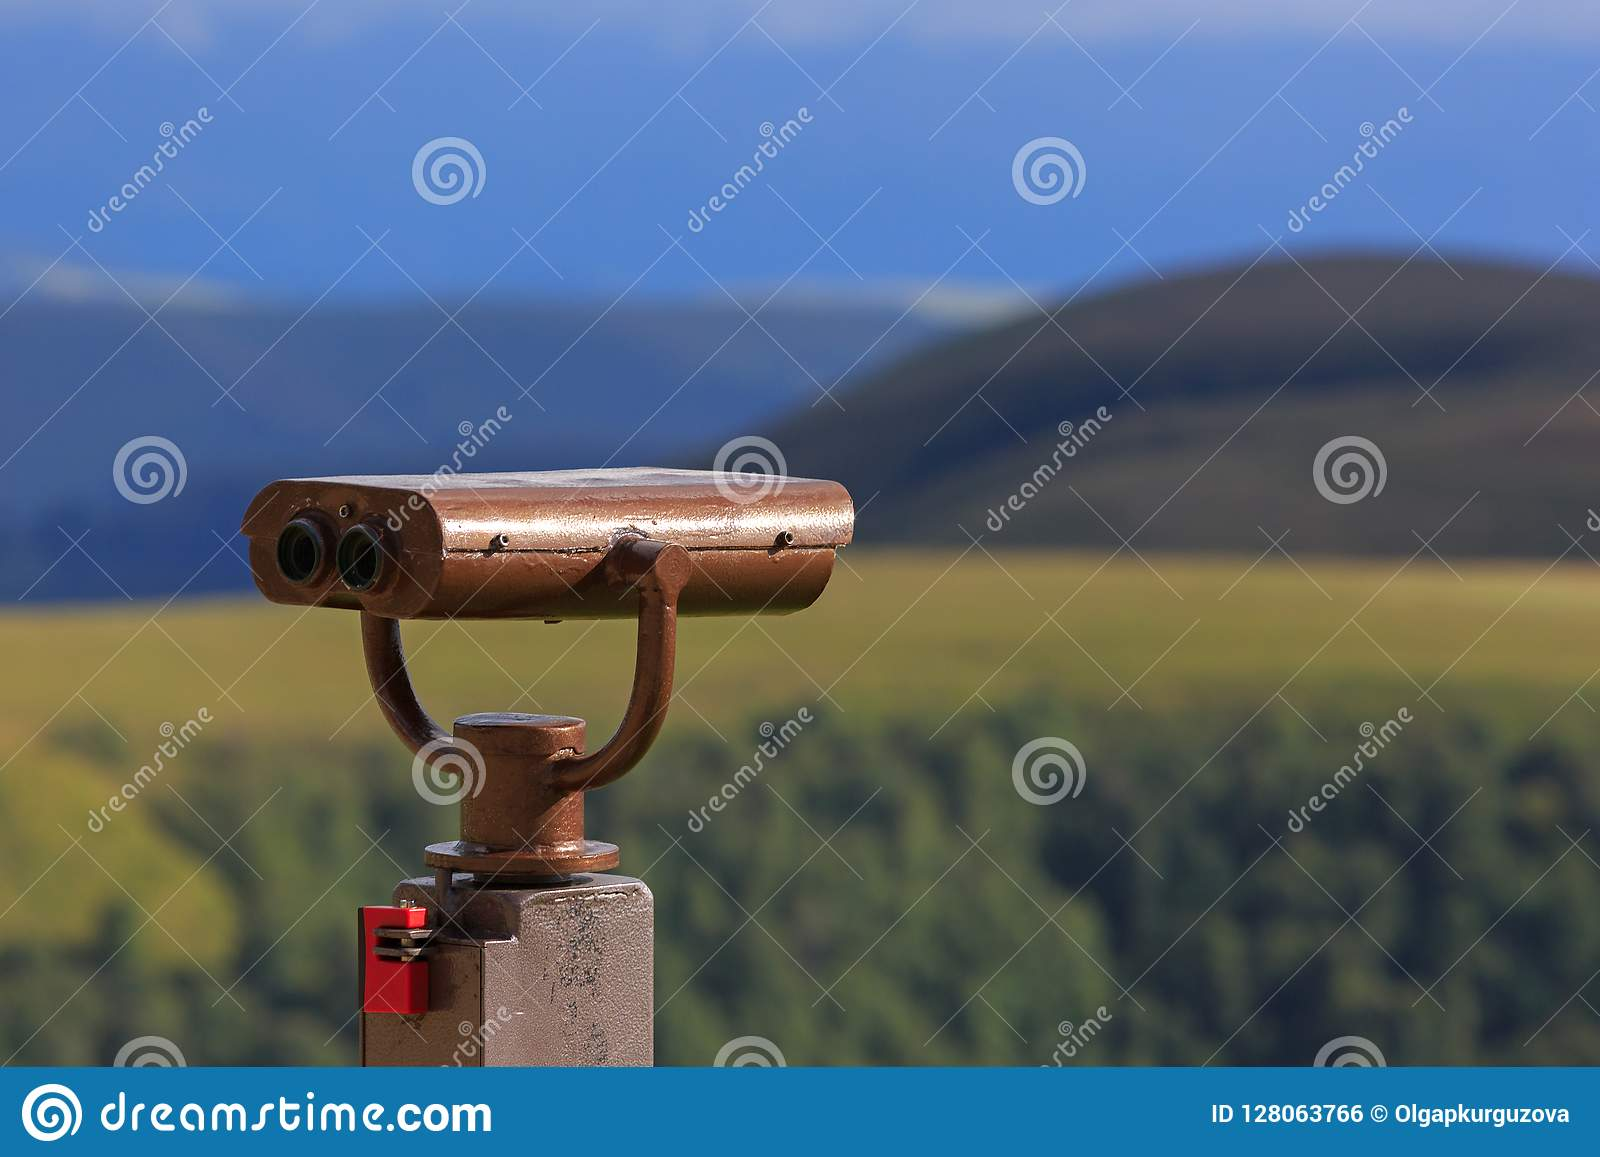 Binoculars on a viewing platform for observing flora, fauna